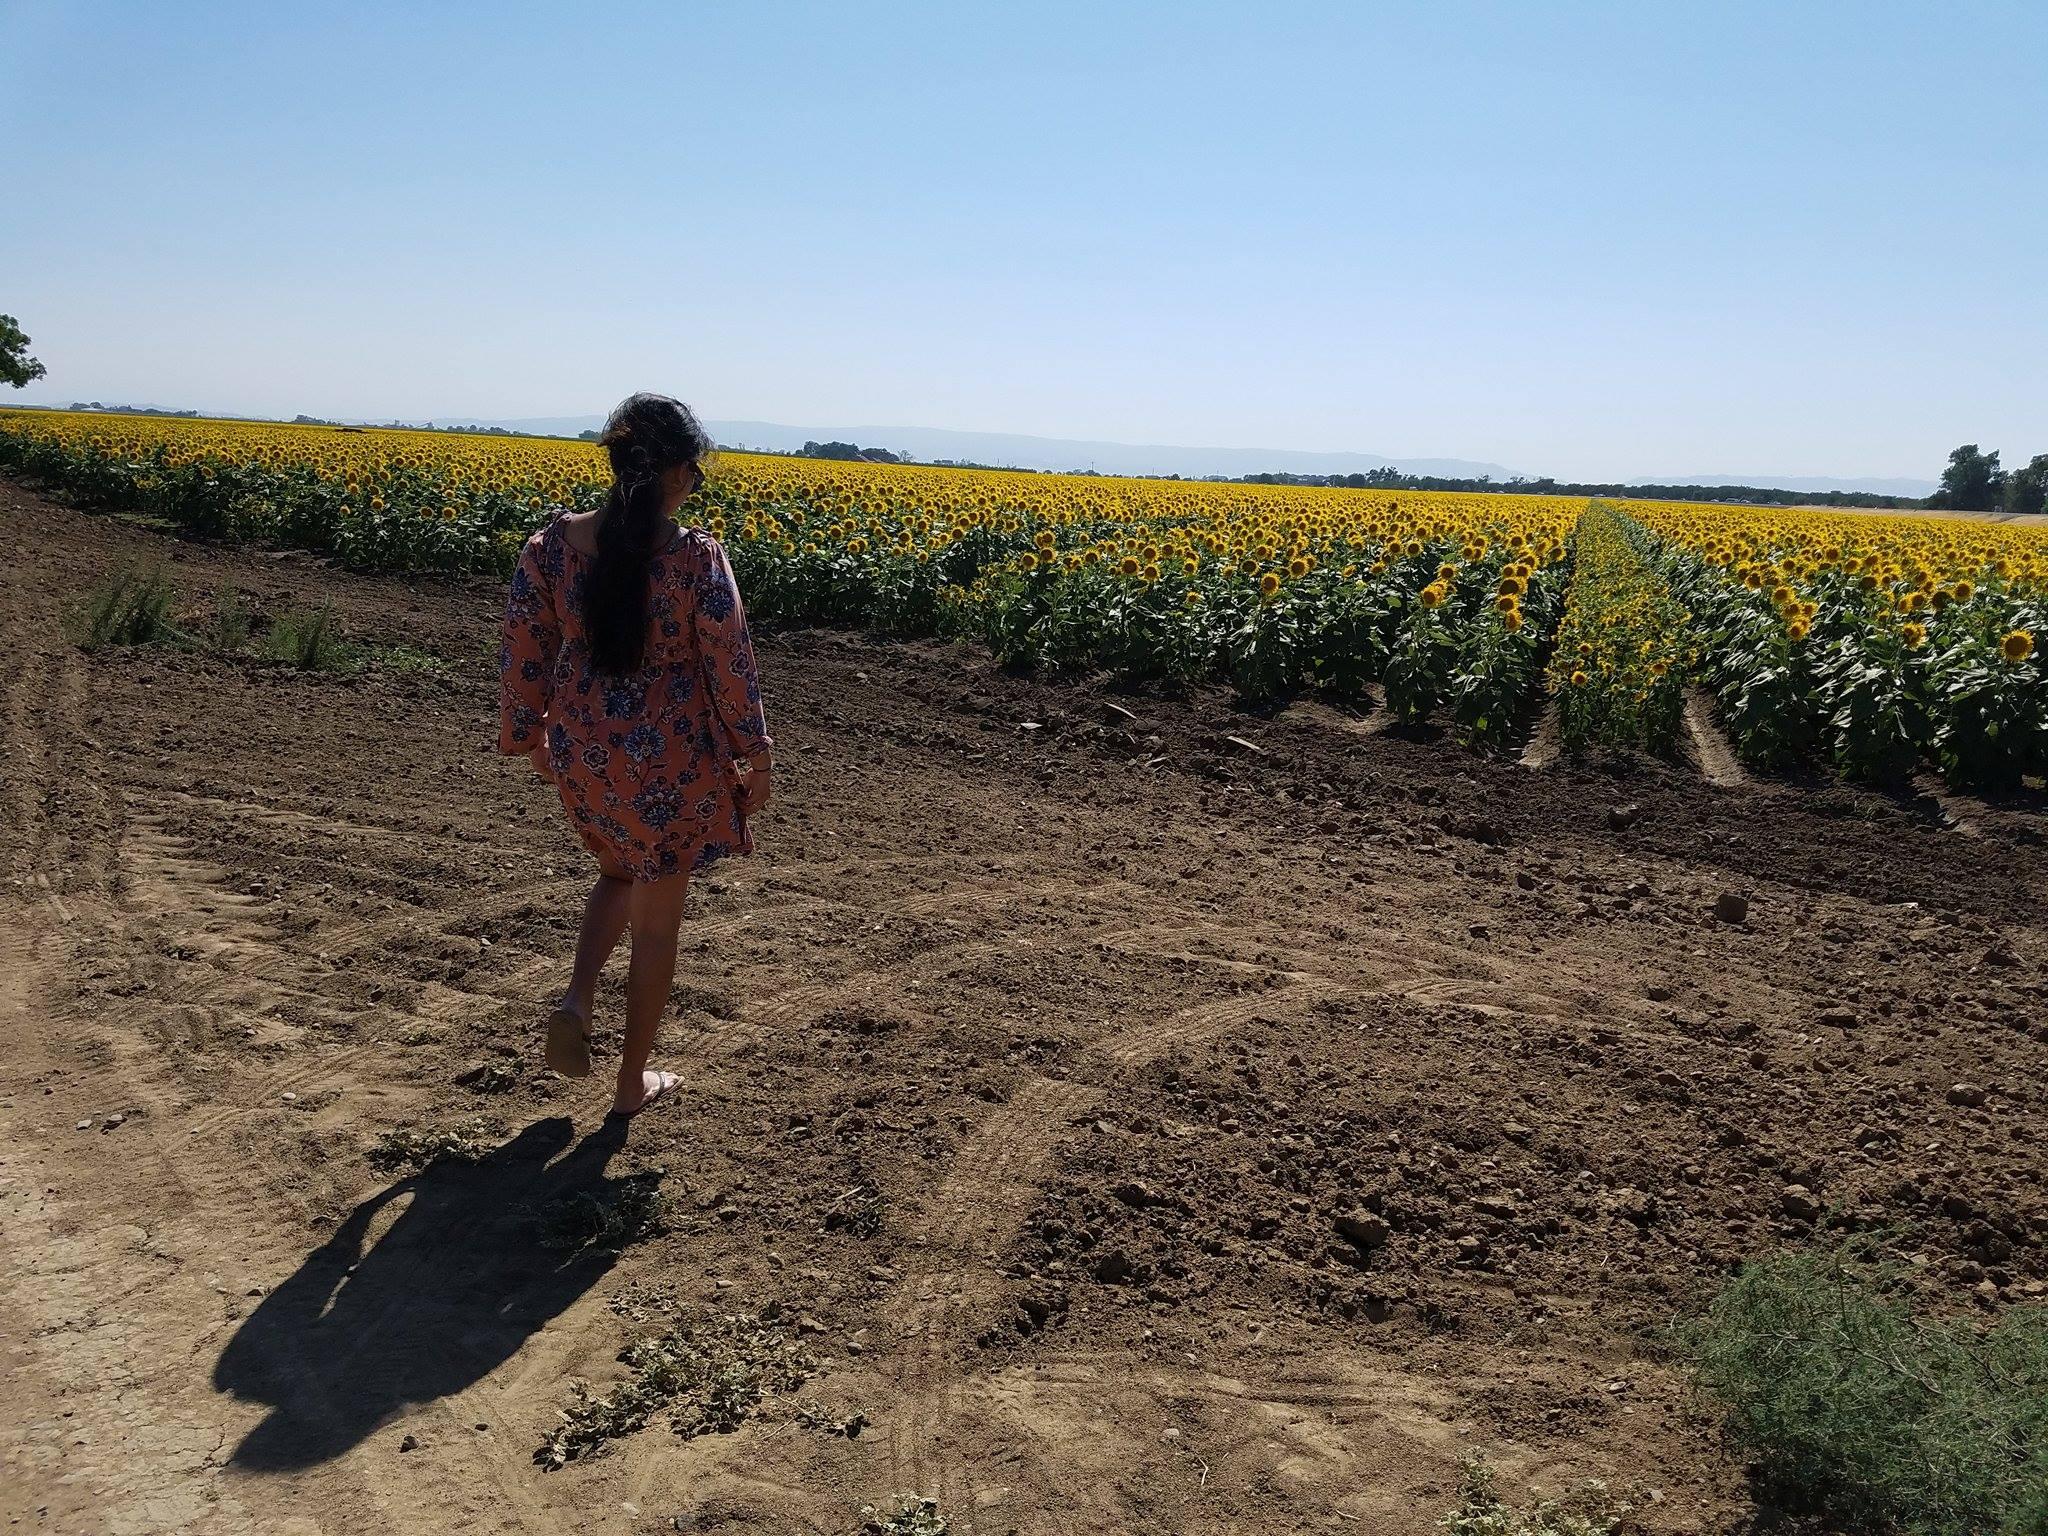 Sunflowers view